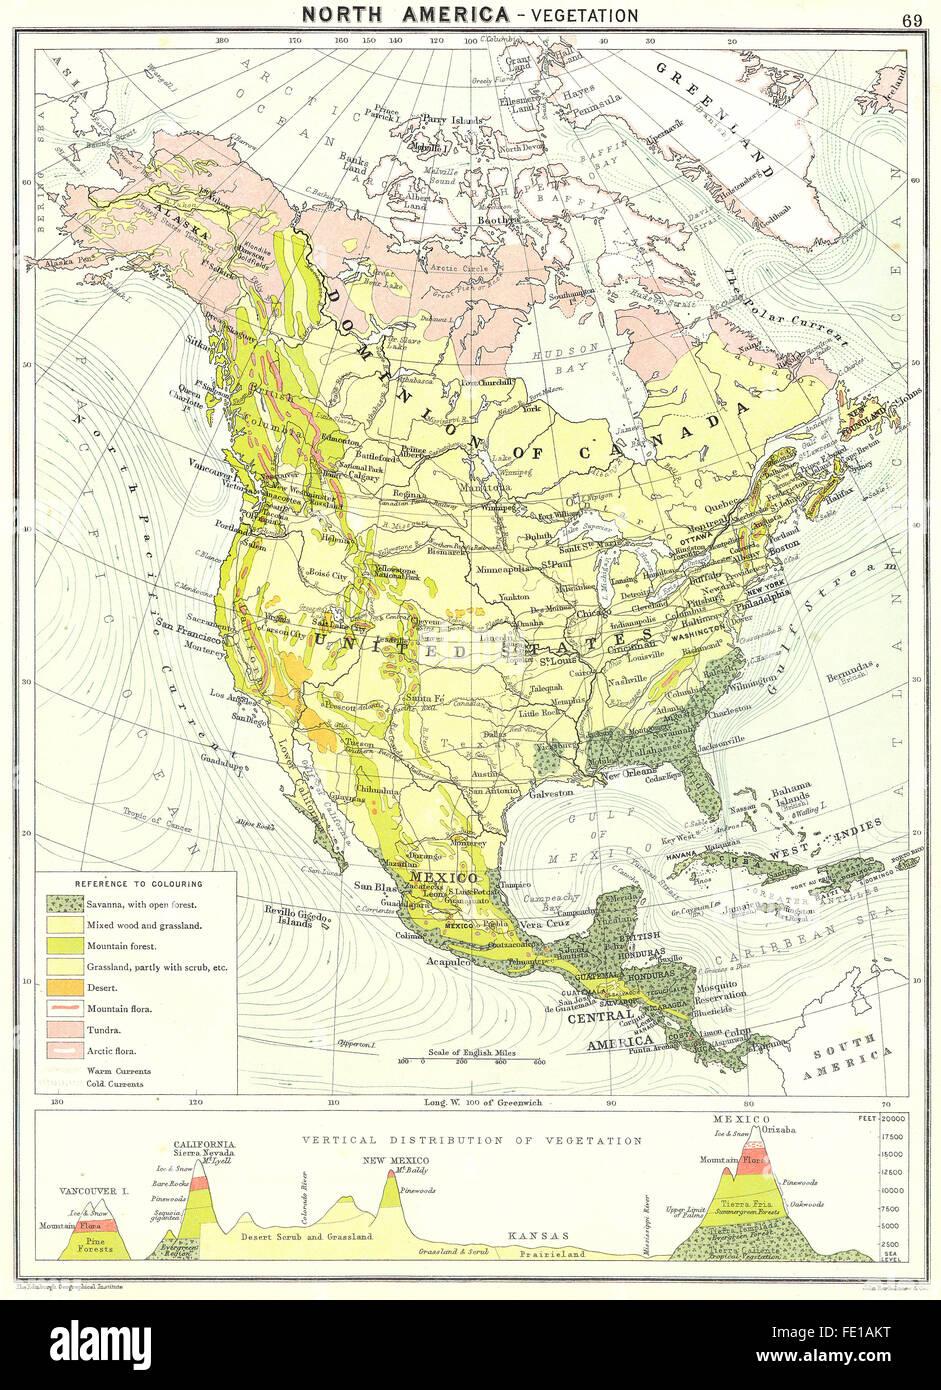 NORTH AMERICA Vegetation 1900 antique map Stock Photo Royalty